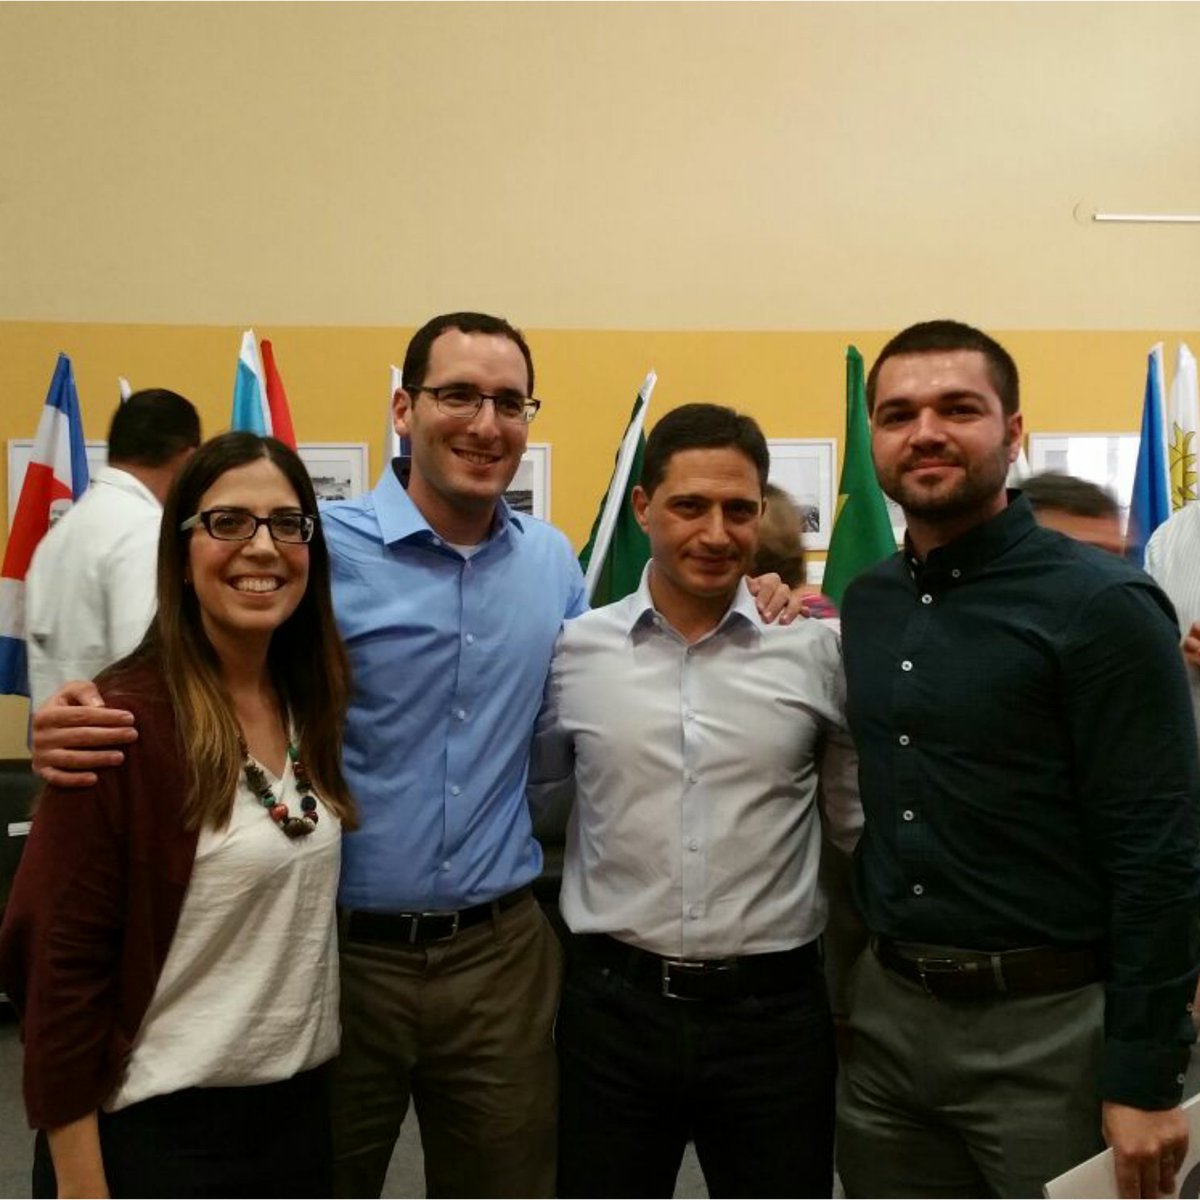 Latin Am&amp;Car Ambassadors in #Israel  and Latin Am&amp;Car div @IsraelMFA had the pleasure of meeting mayor of #BeerSheva, Mr. @RuvikDanilovich<br>http://pic.twitter.com/ev54tHEOgI